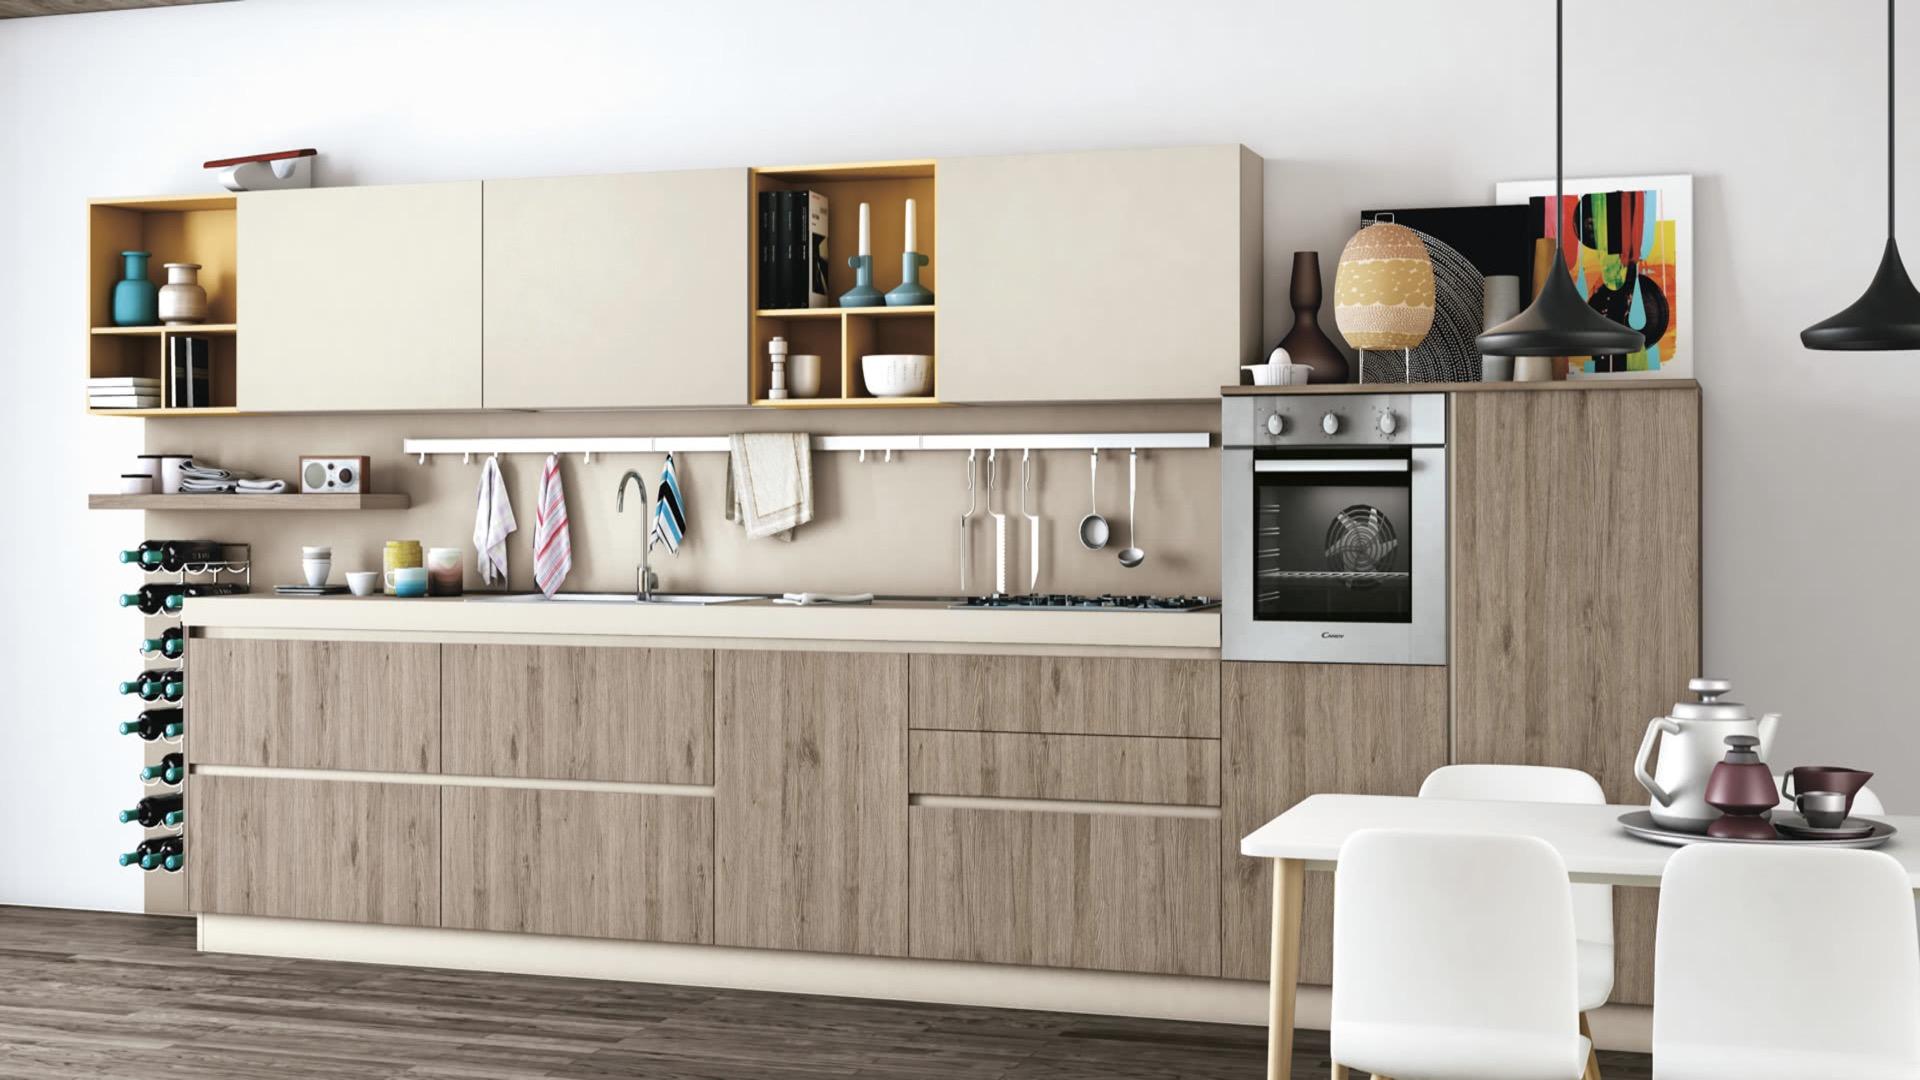 Cucine-Creo-Moderne-MilanoCR - ANK